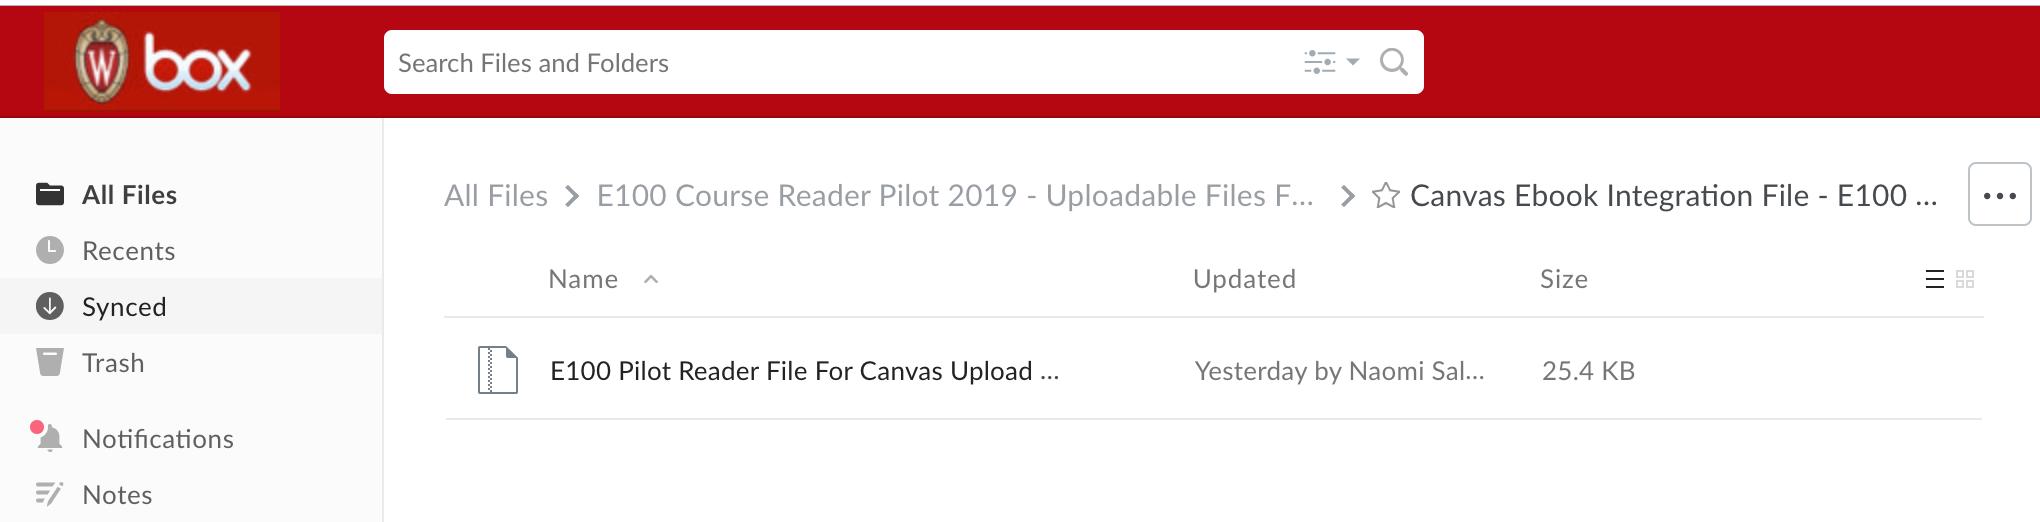 screenshot of BOX folder containing a single Zip file--the E100 course reader zip file